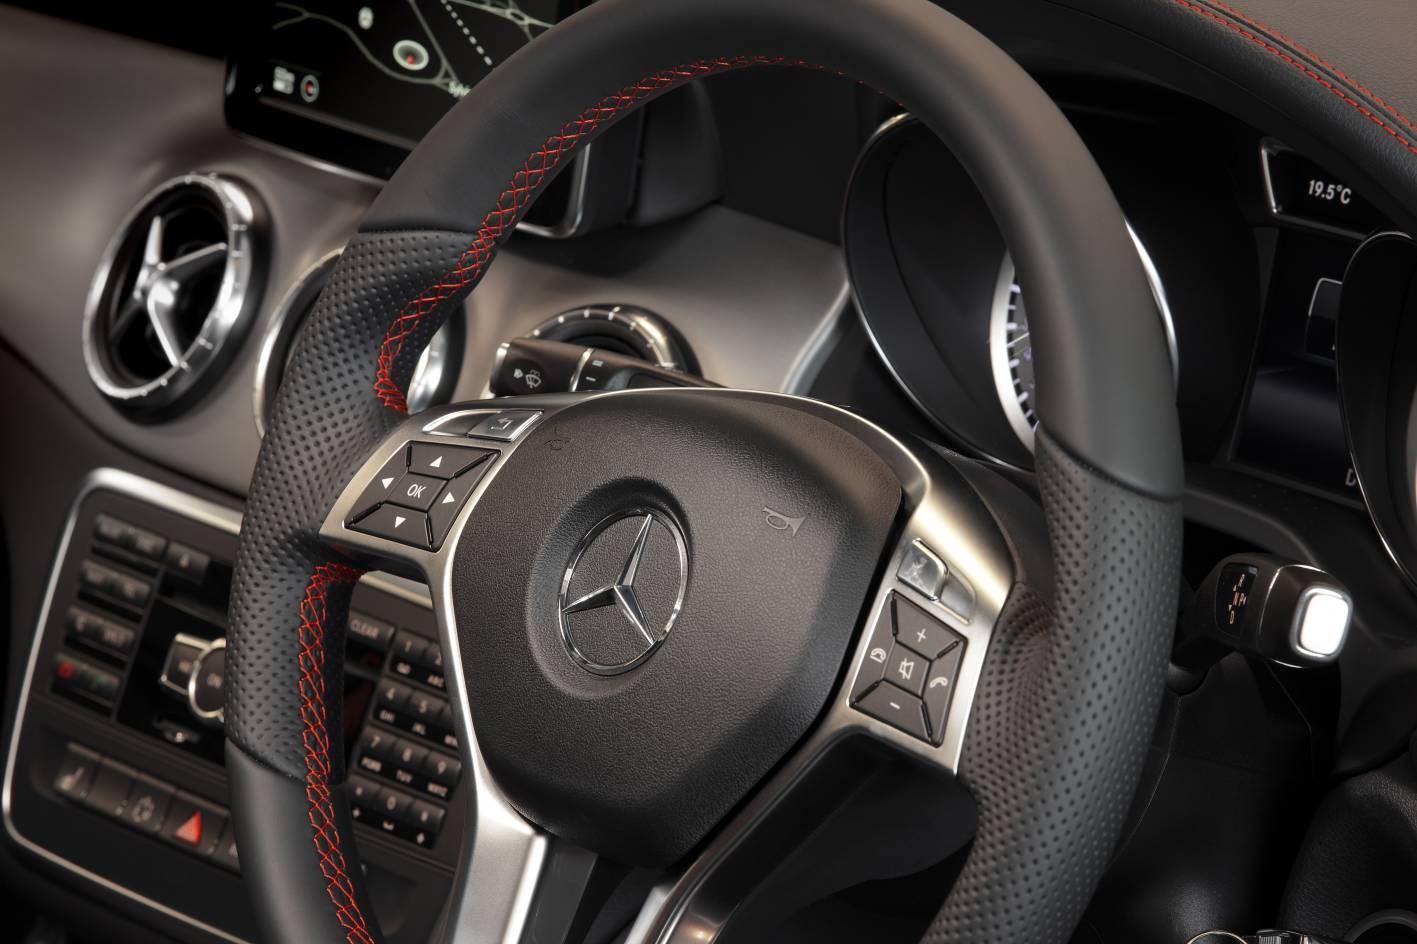 mercedes benz cla 2014 interior. 2014 mercedesbenz cla 4d coupe 250 sport mercedes benz cla interior